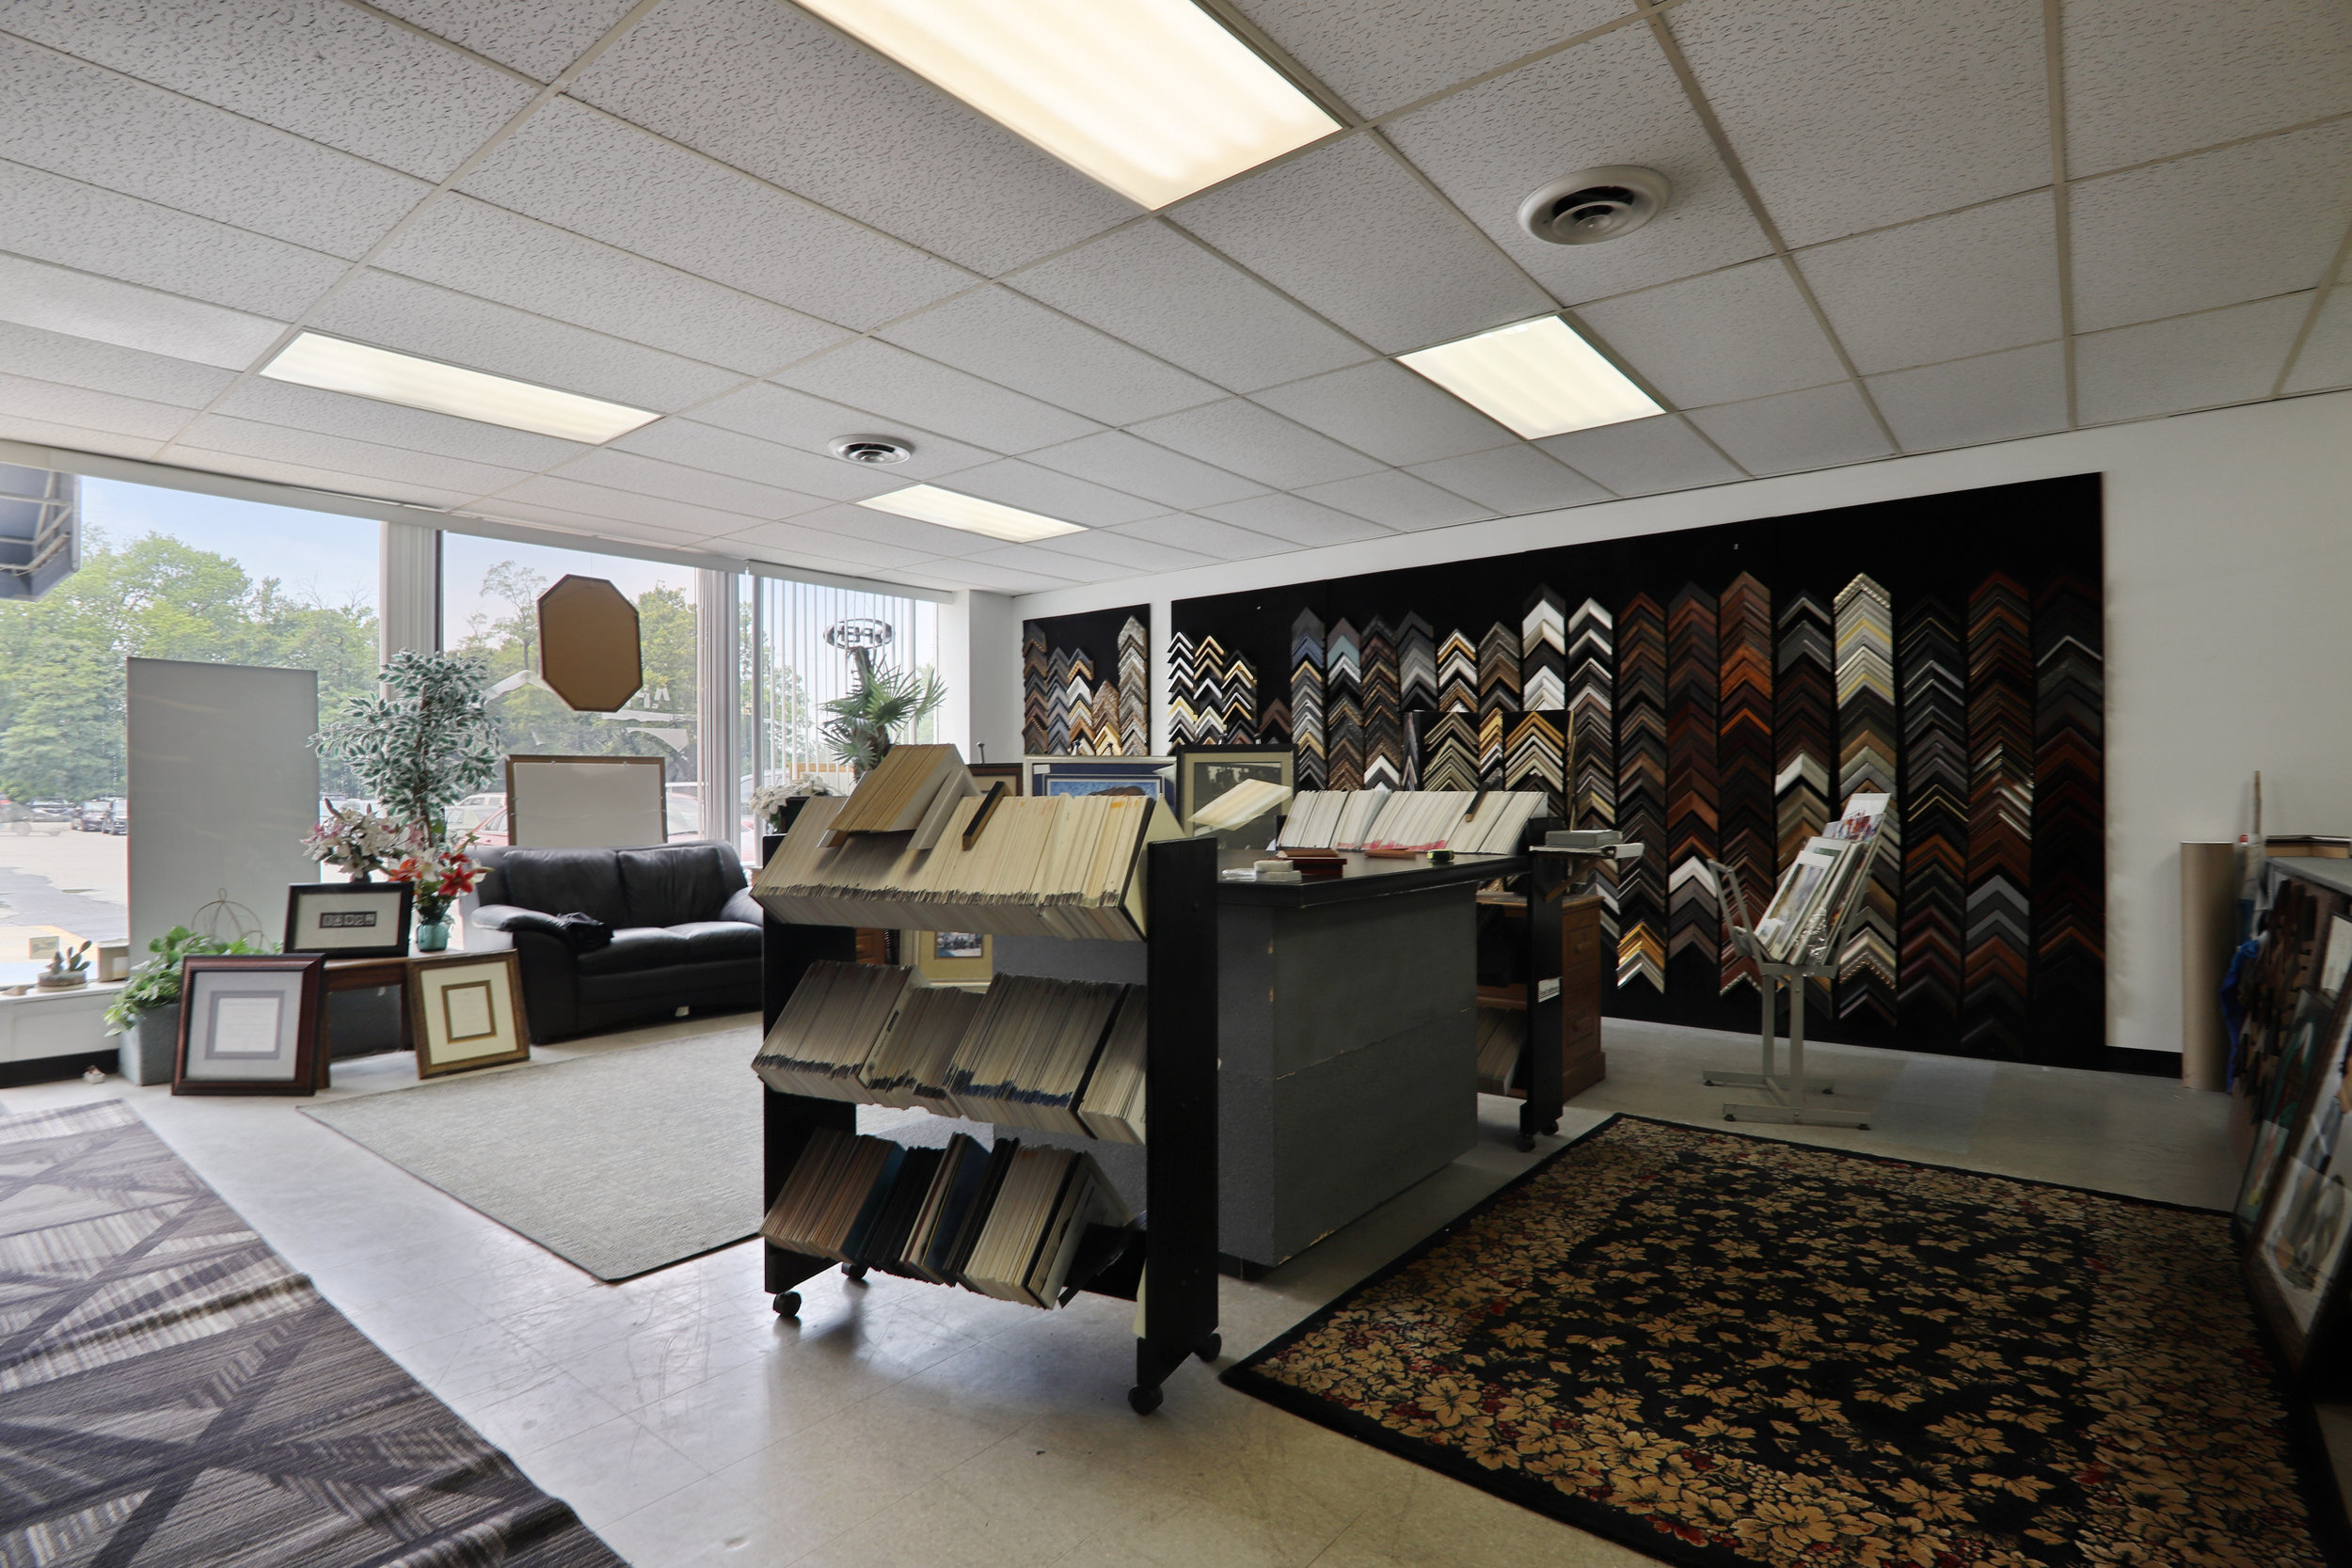 Interiors-Front Room-MG2052.JPG